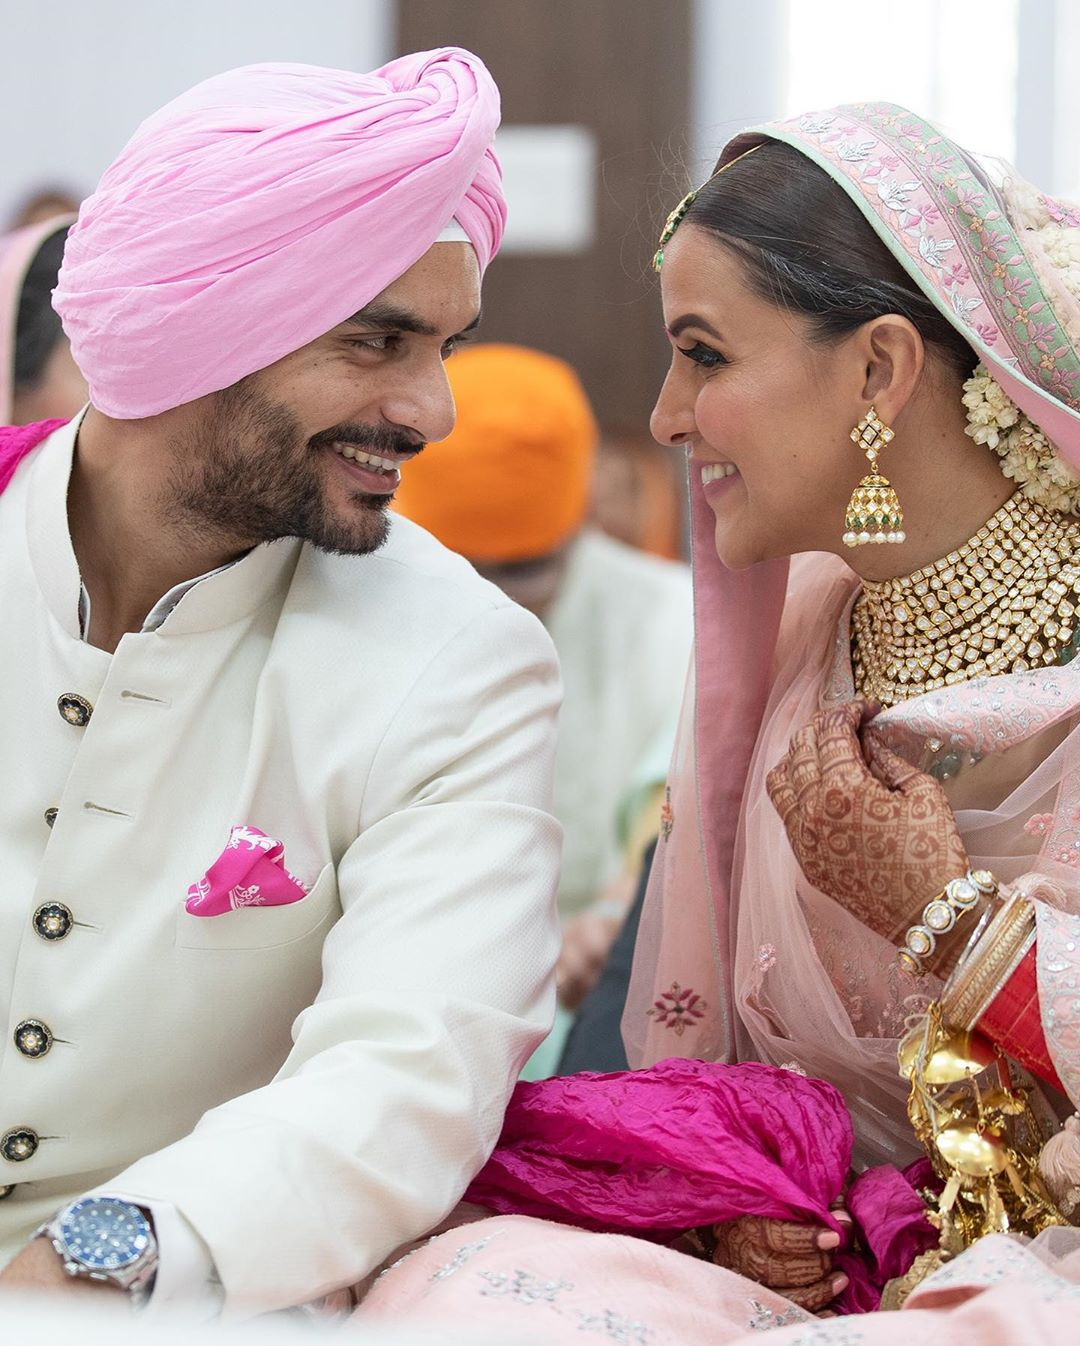 (c) Ashish Parmar | neha dhupia agad bedi wedding | pastel lehenga | pink lehenga